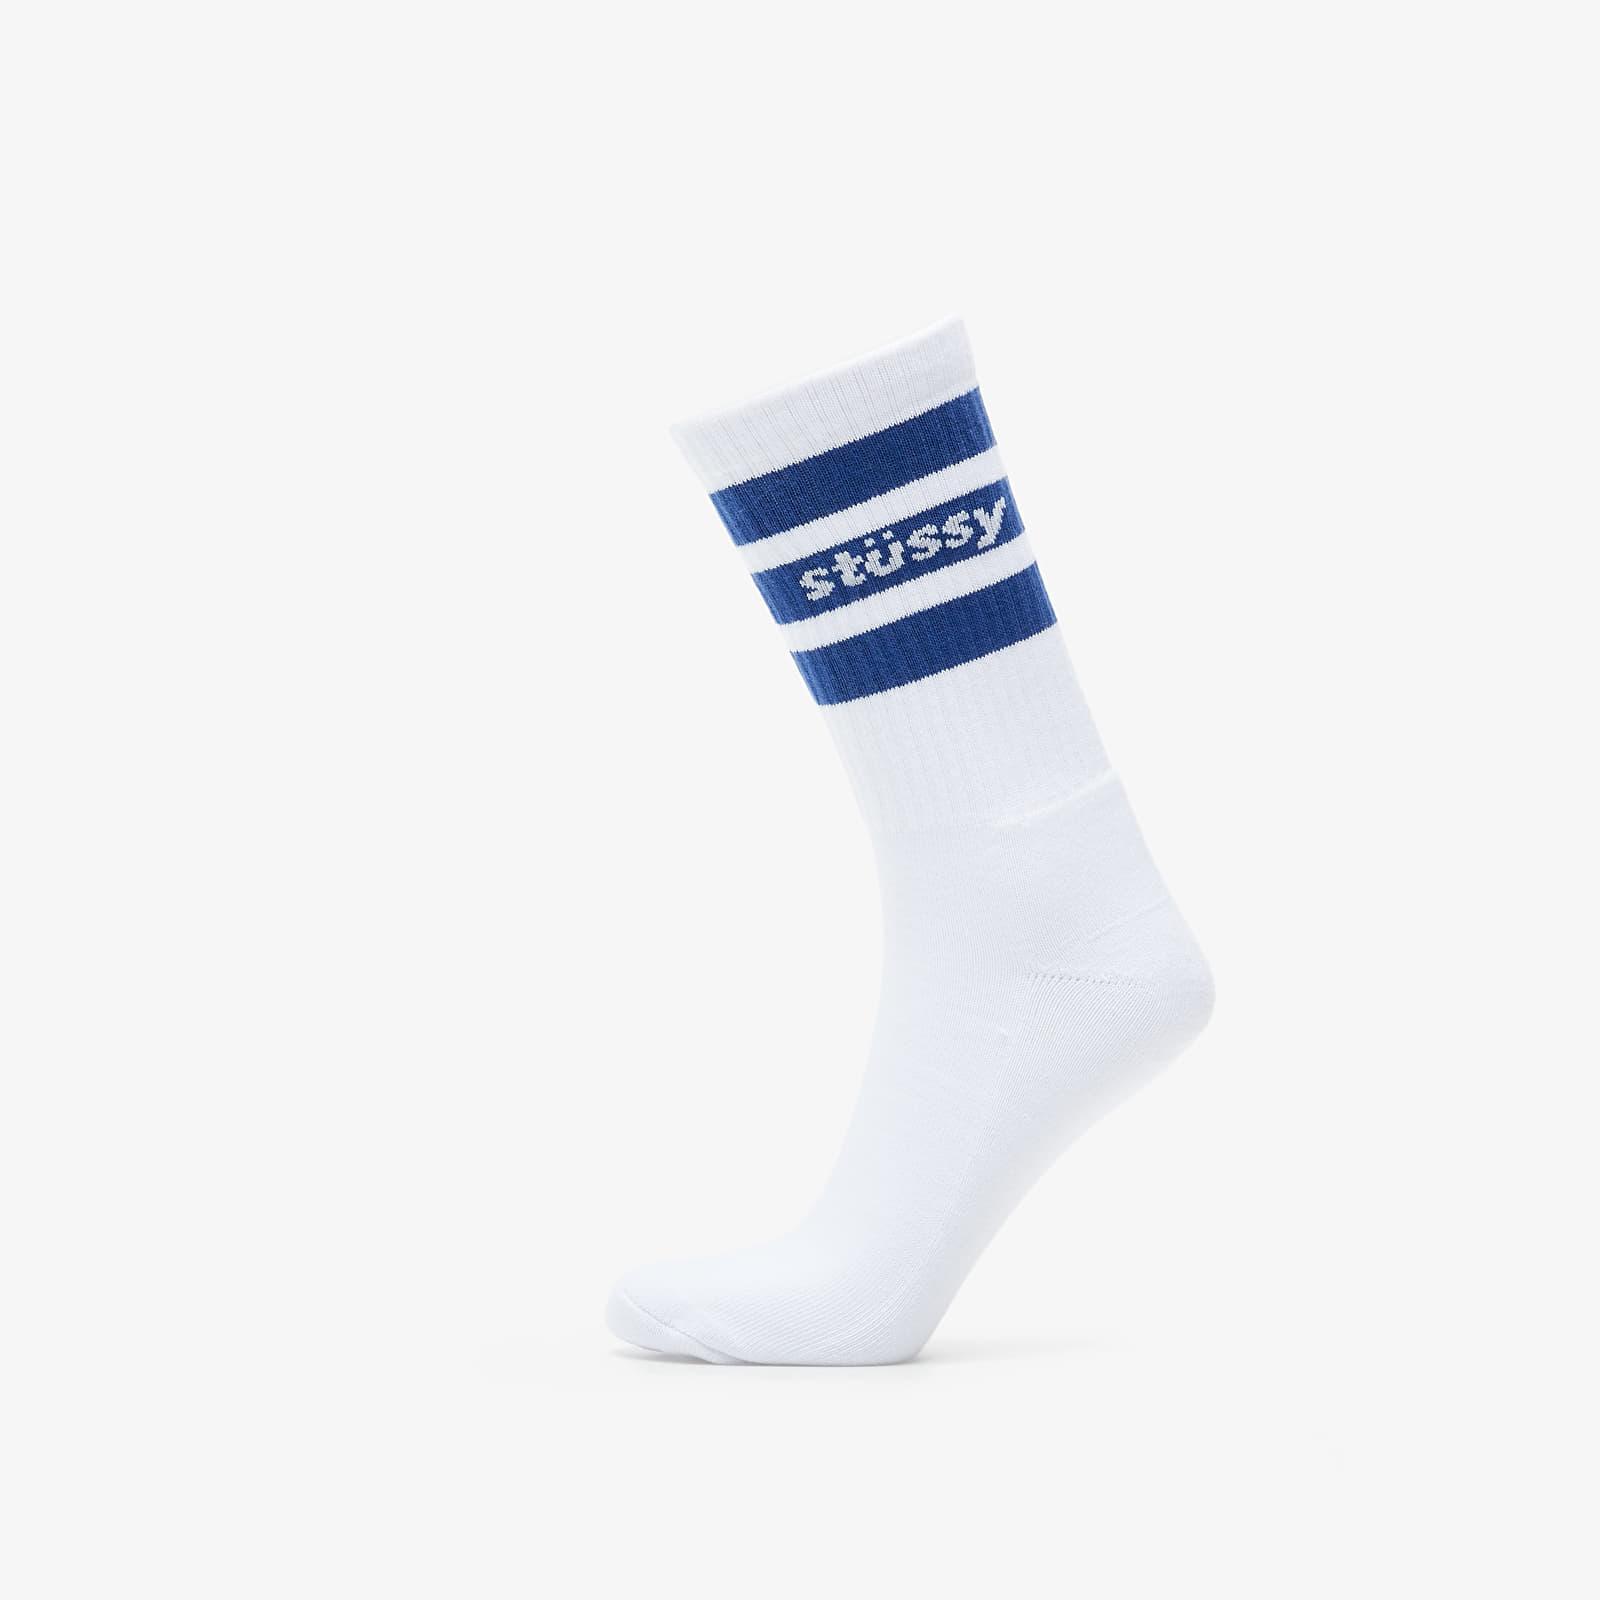 обычные носки Stüssy Sport Crew Socks White/ Navy